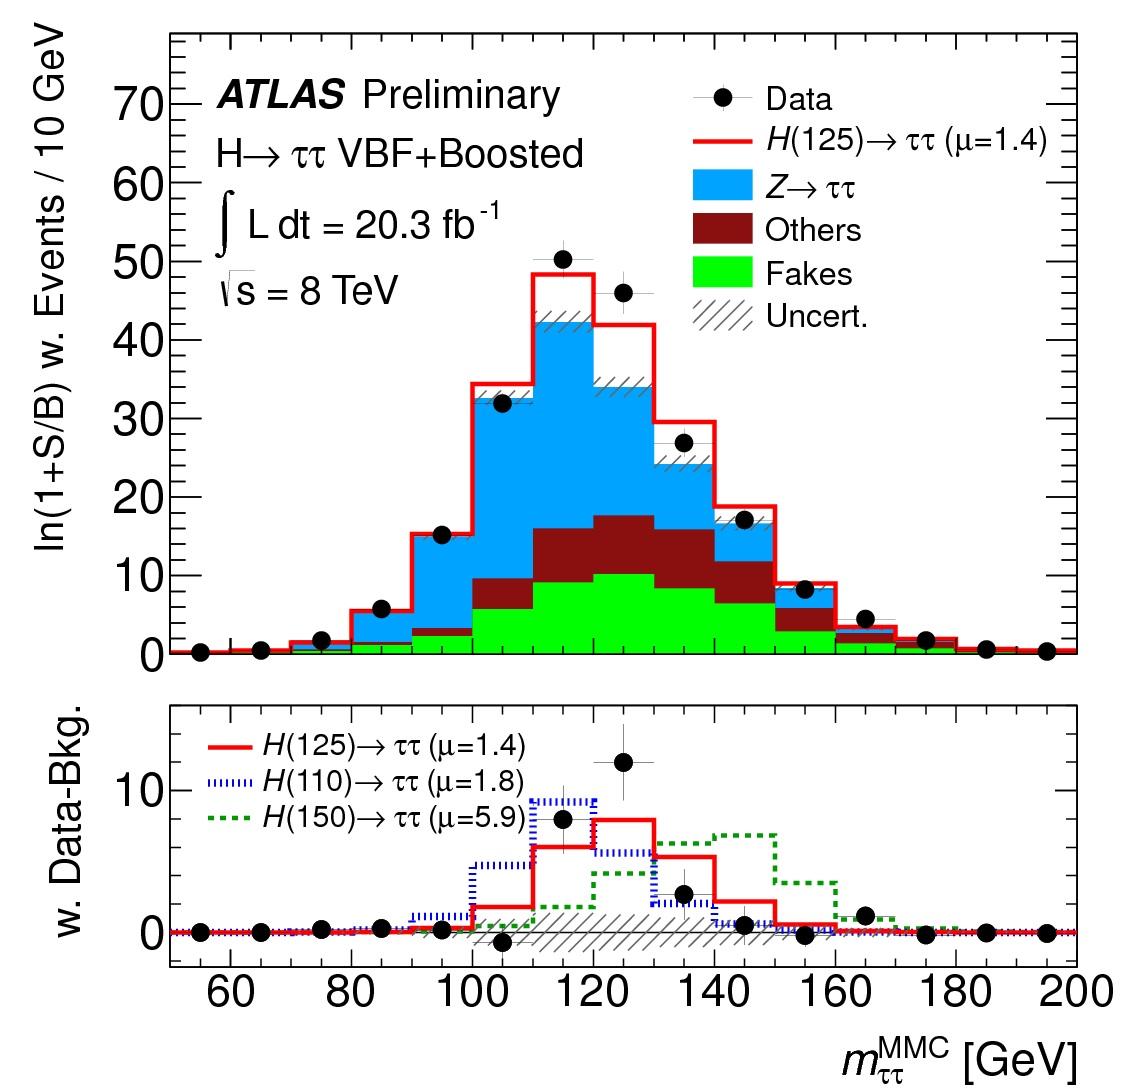 ATLAS-H-tautau